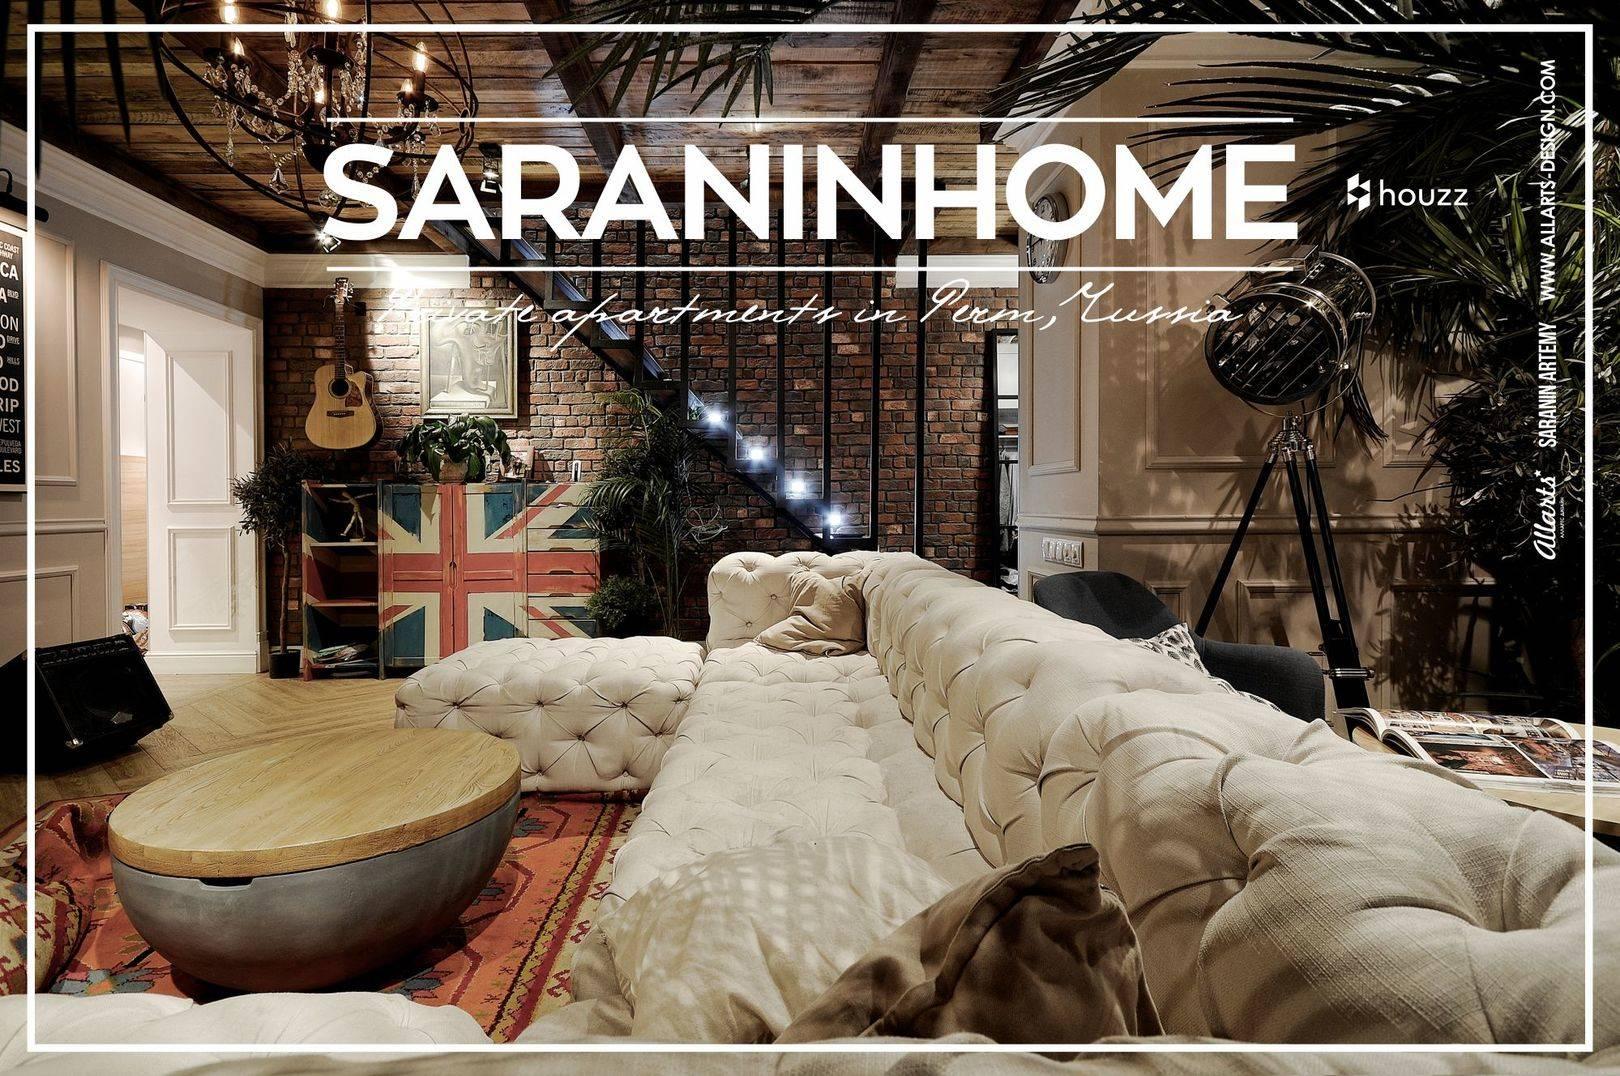 Дизайн интерьера квартира дизайнера Saraninhome